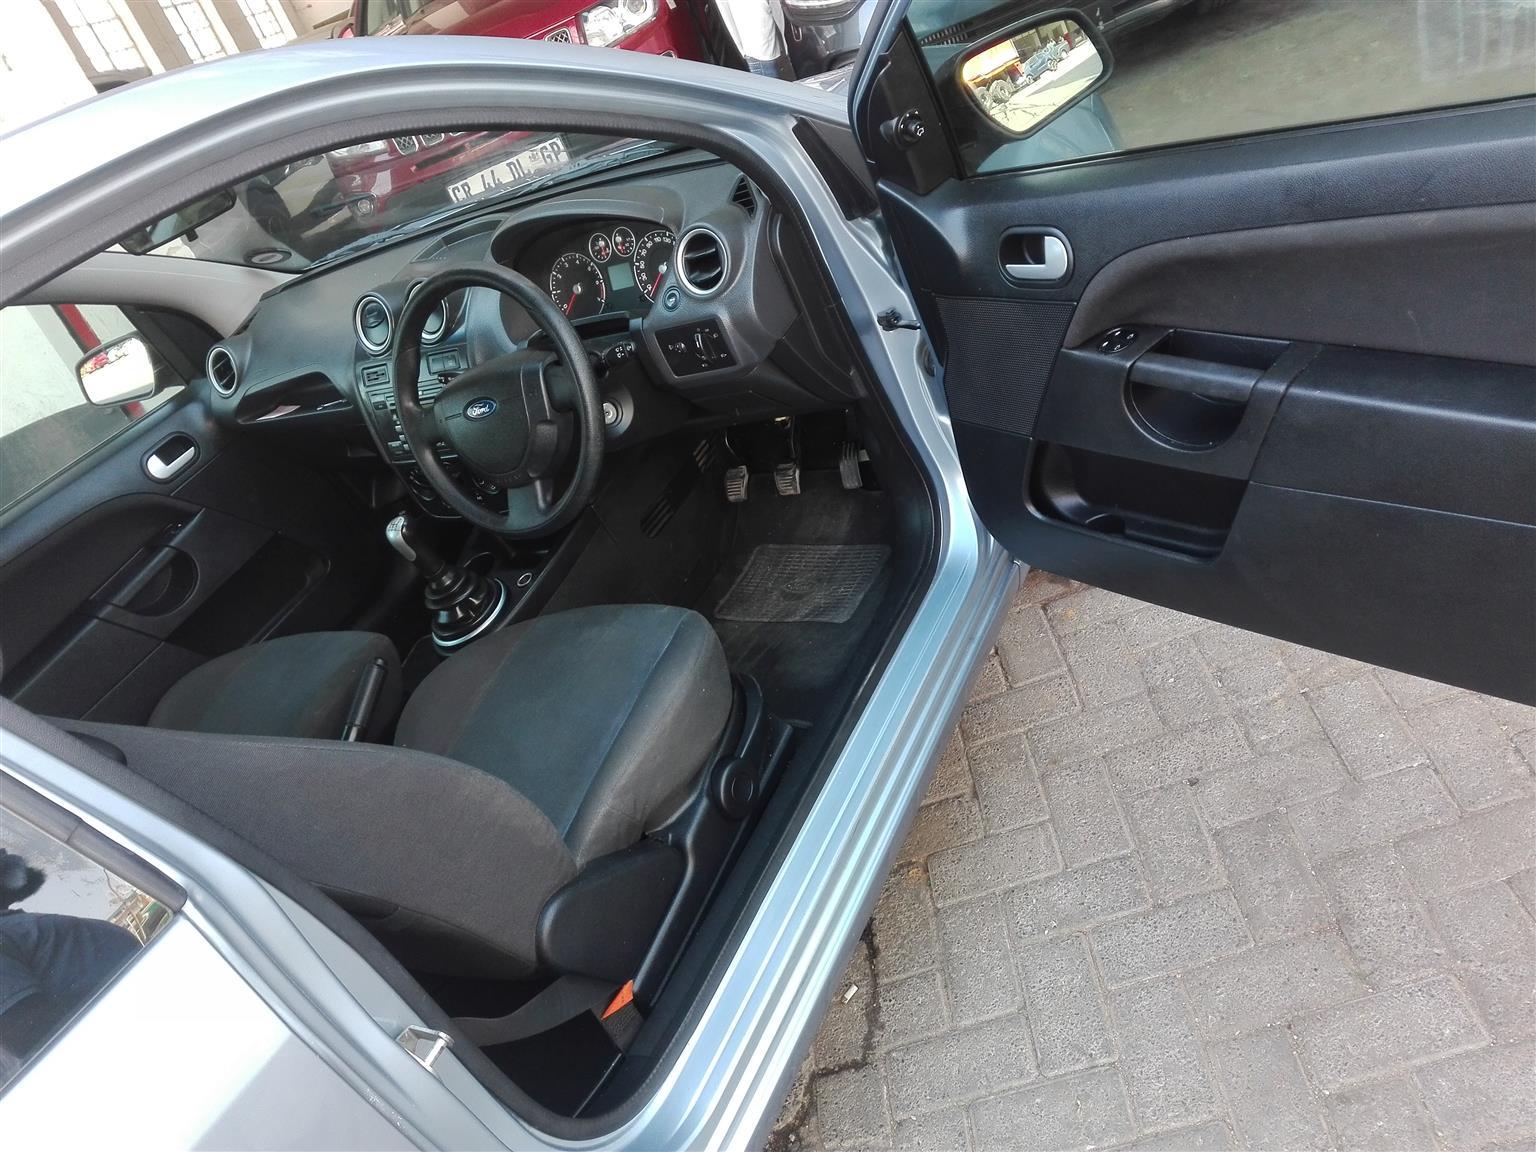 2006 Ford Fiesta 1.4 5 door Ambiente